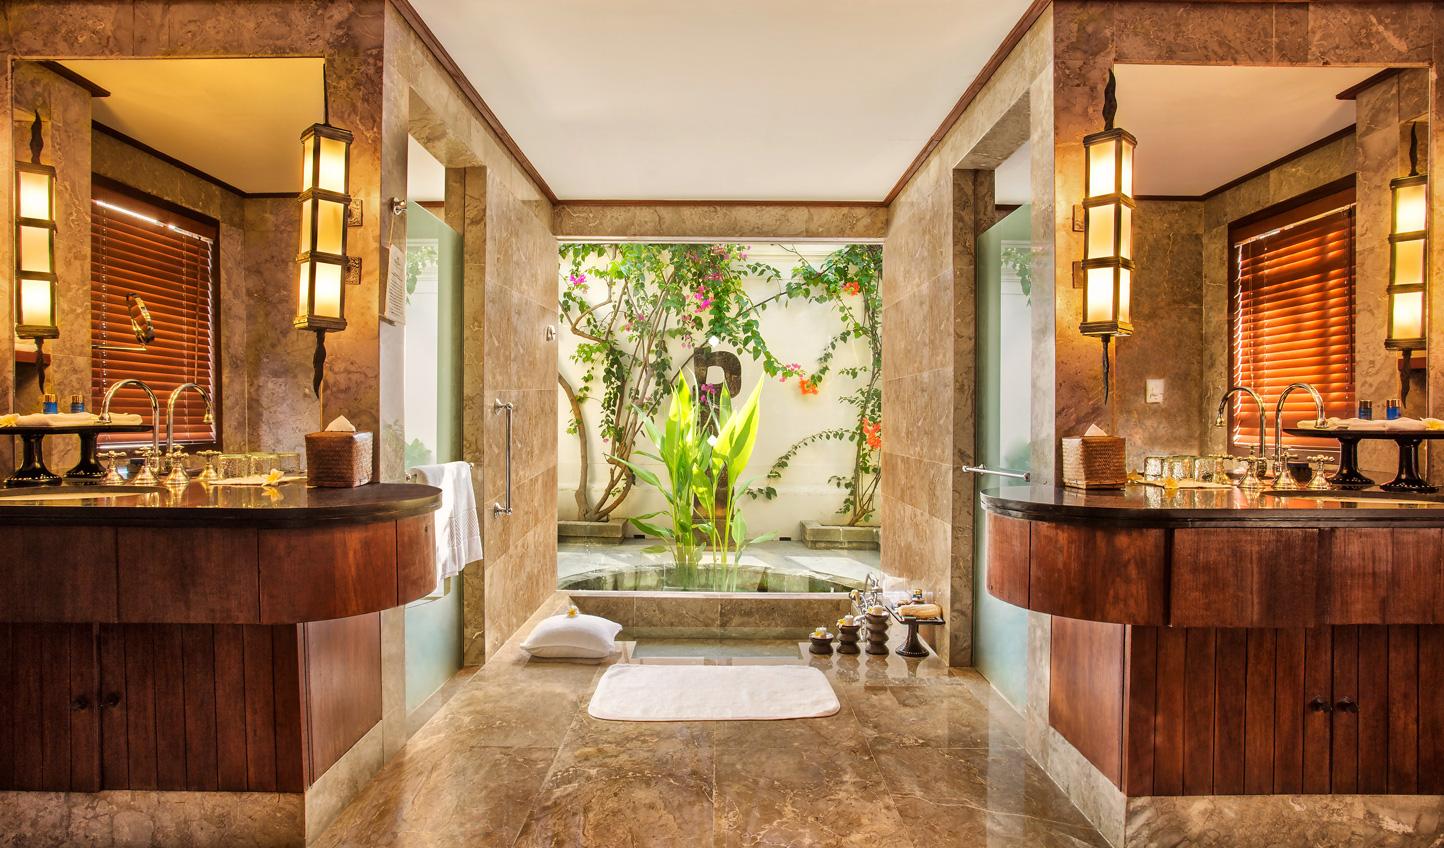 Tropical luxury runs throughout the Oberoi